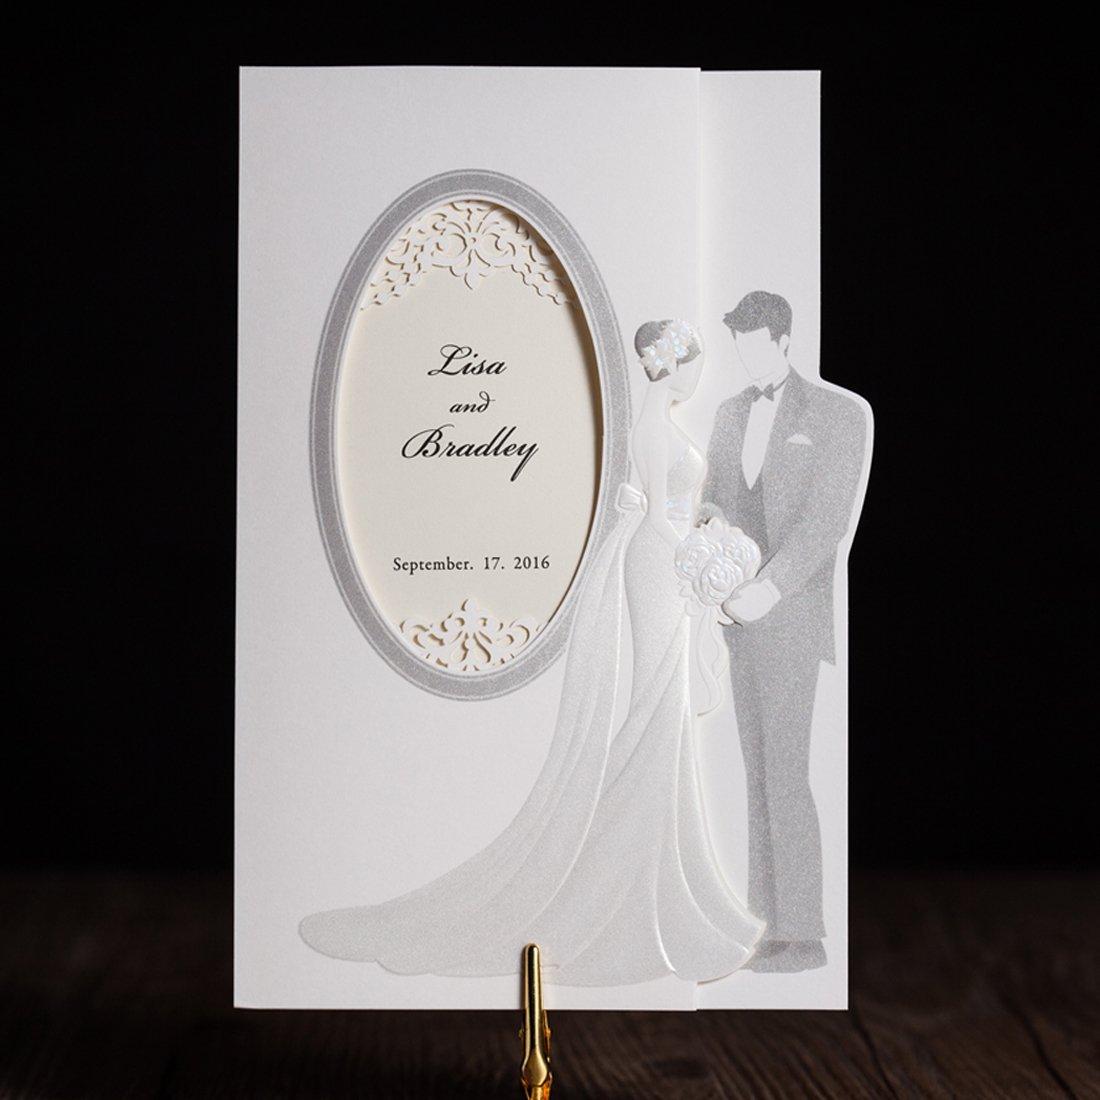 Brides Wedding Invitation Kit: Wishmade 50x Luxury Trifold Wedding Invitations Cards Kits